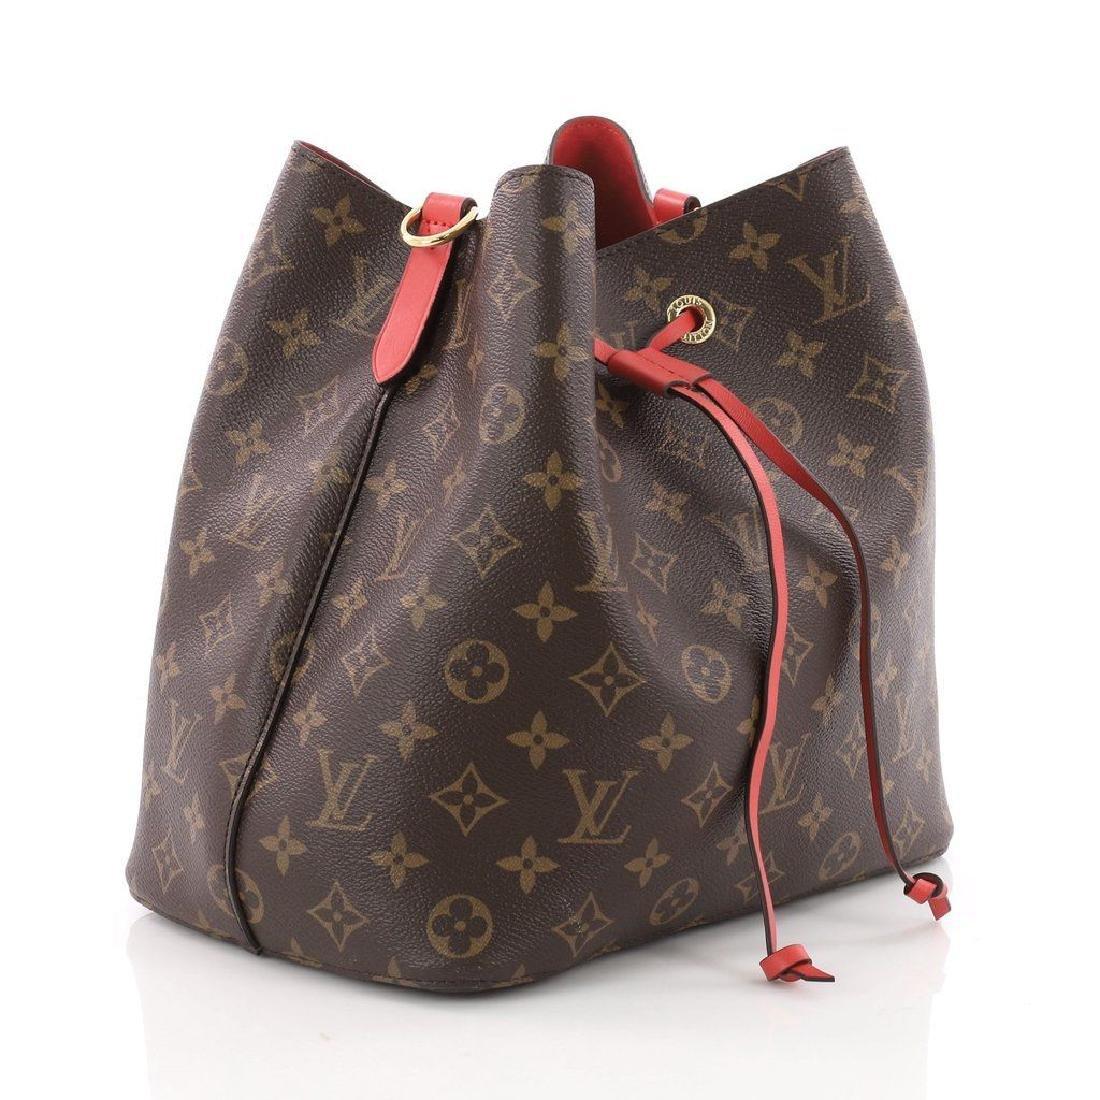 Louis Vuitton Neonoe Monogram Bucket Bag Drawstring - 2